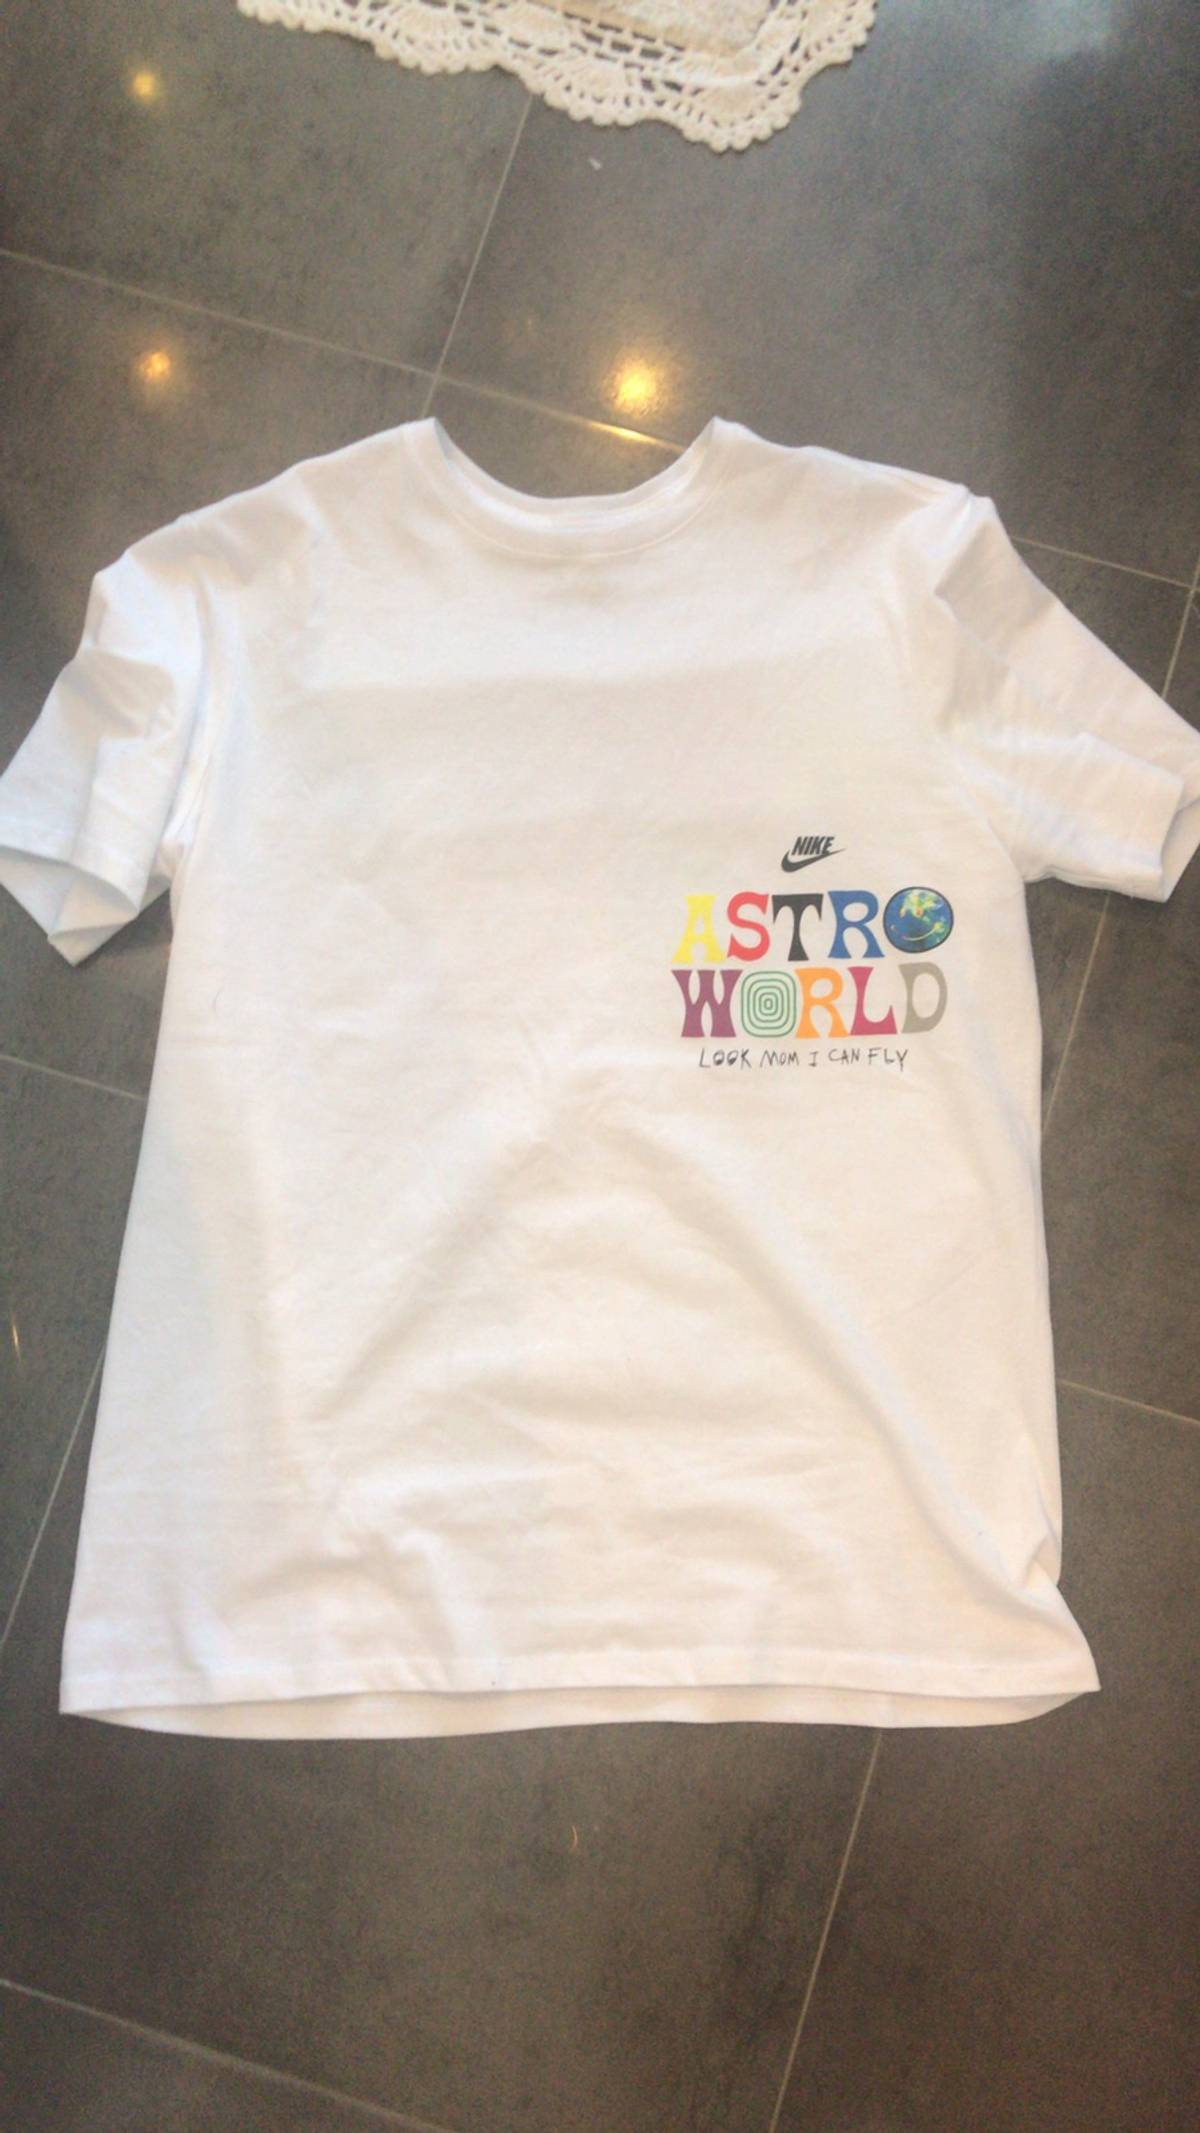 astroworld x nike t shirt